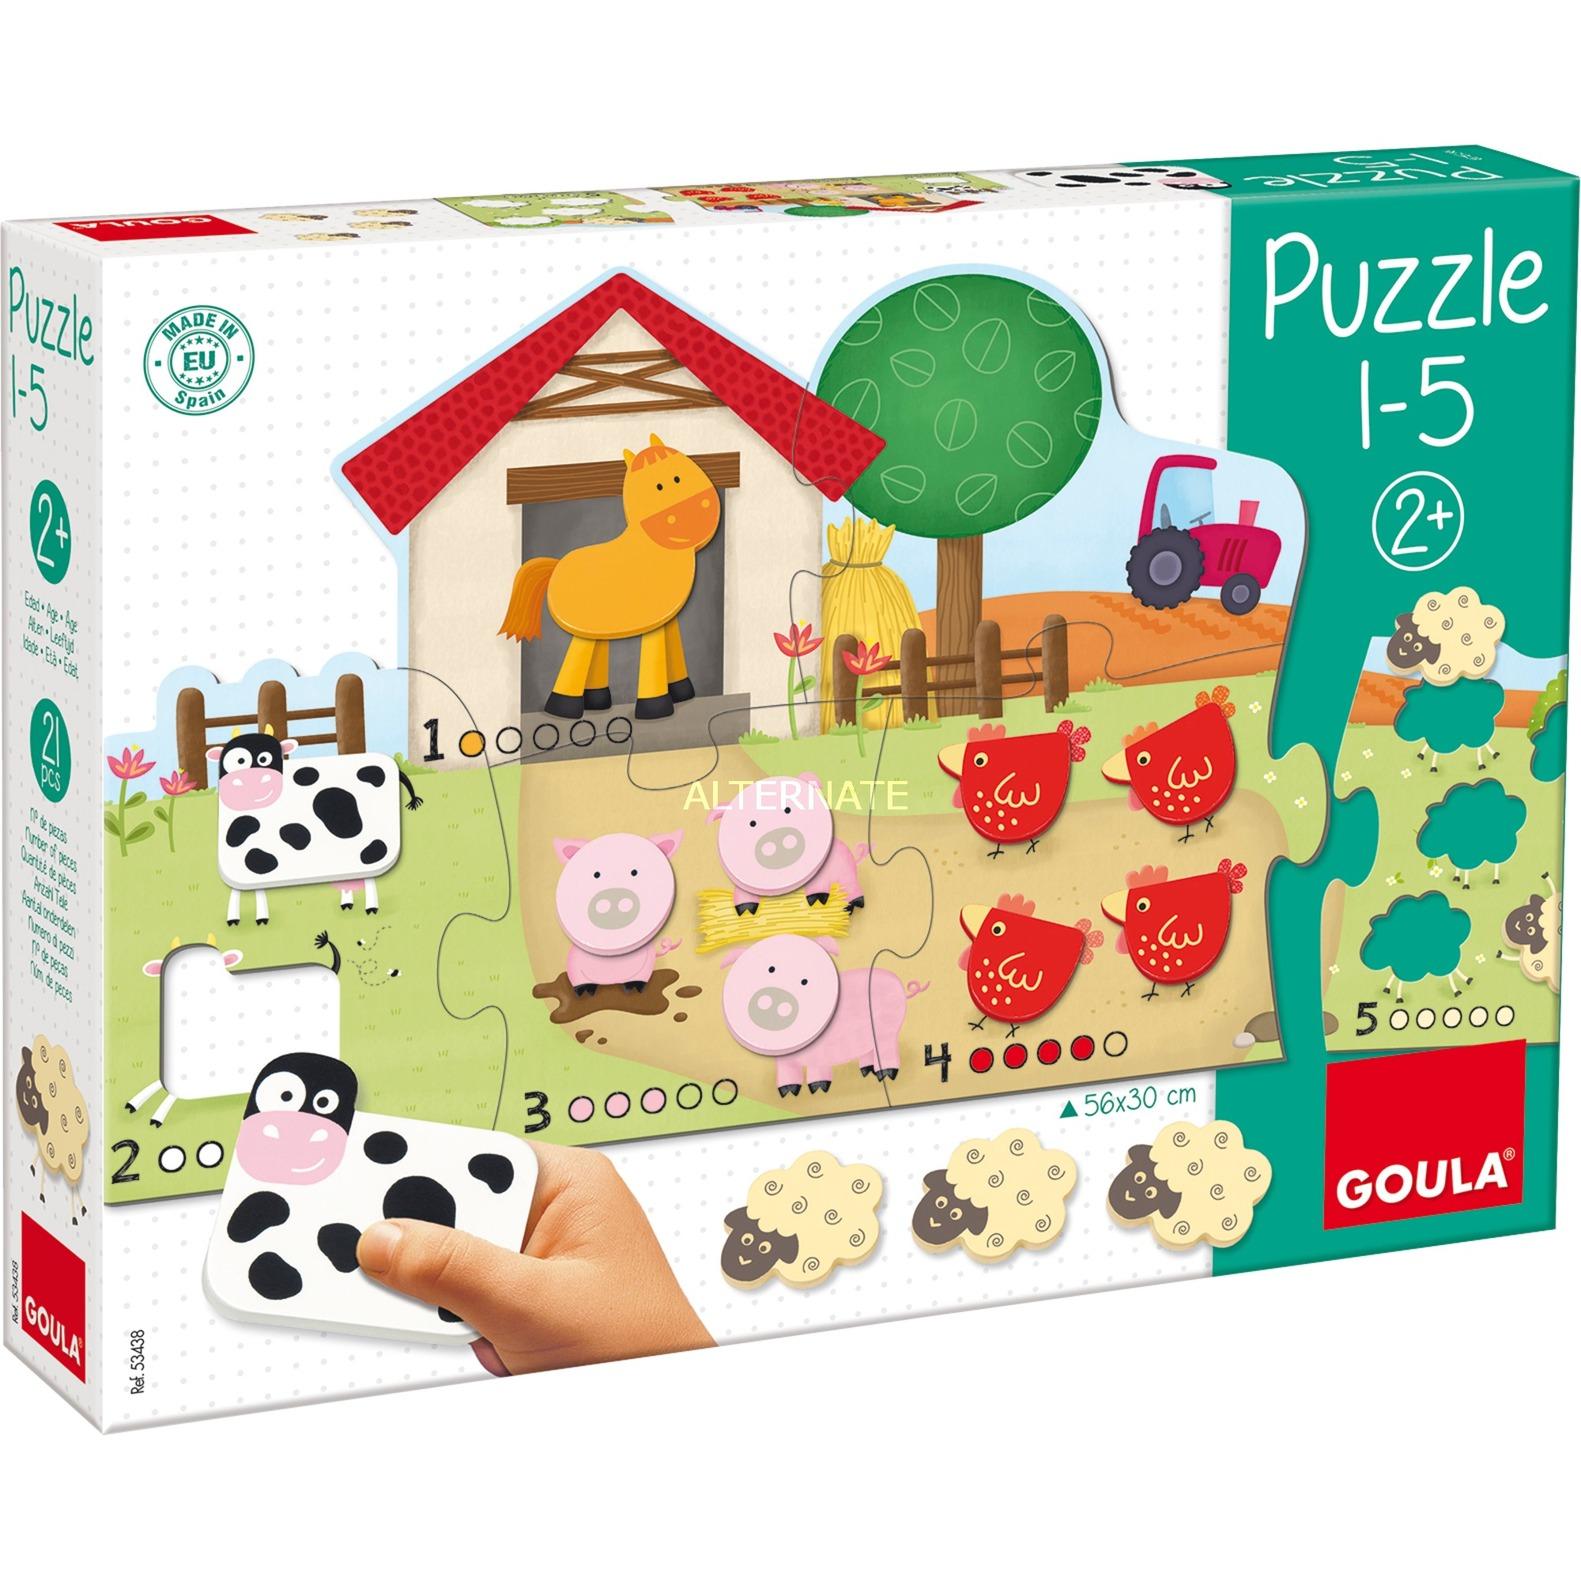 1-5 Puzzle Puzzles